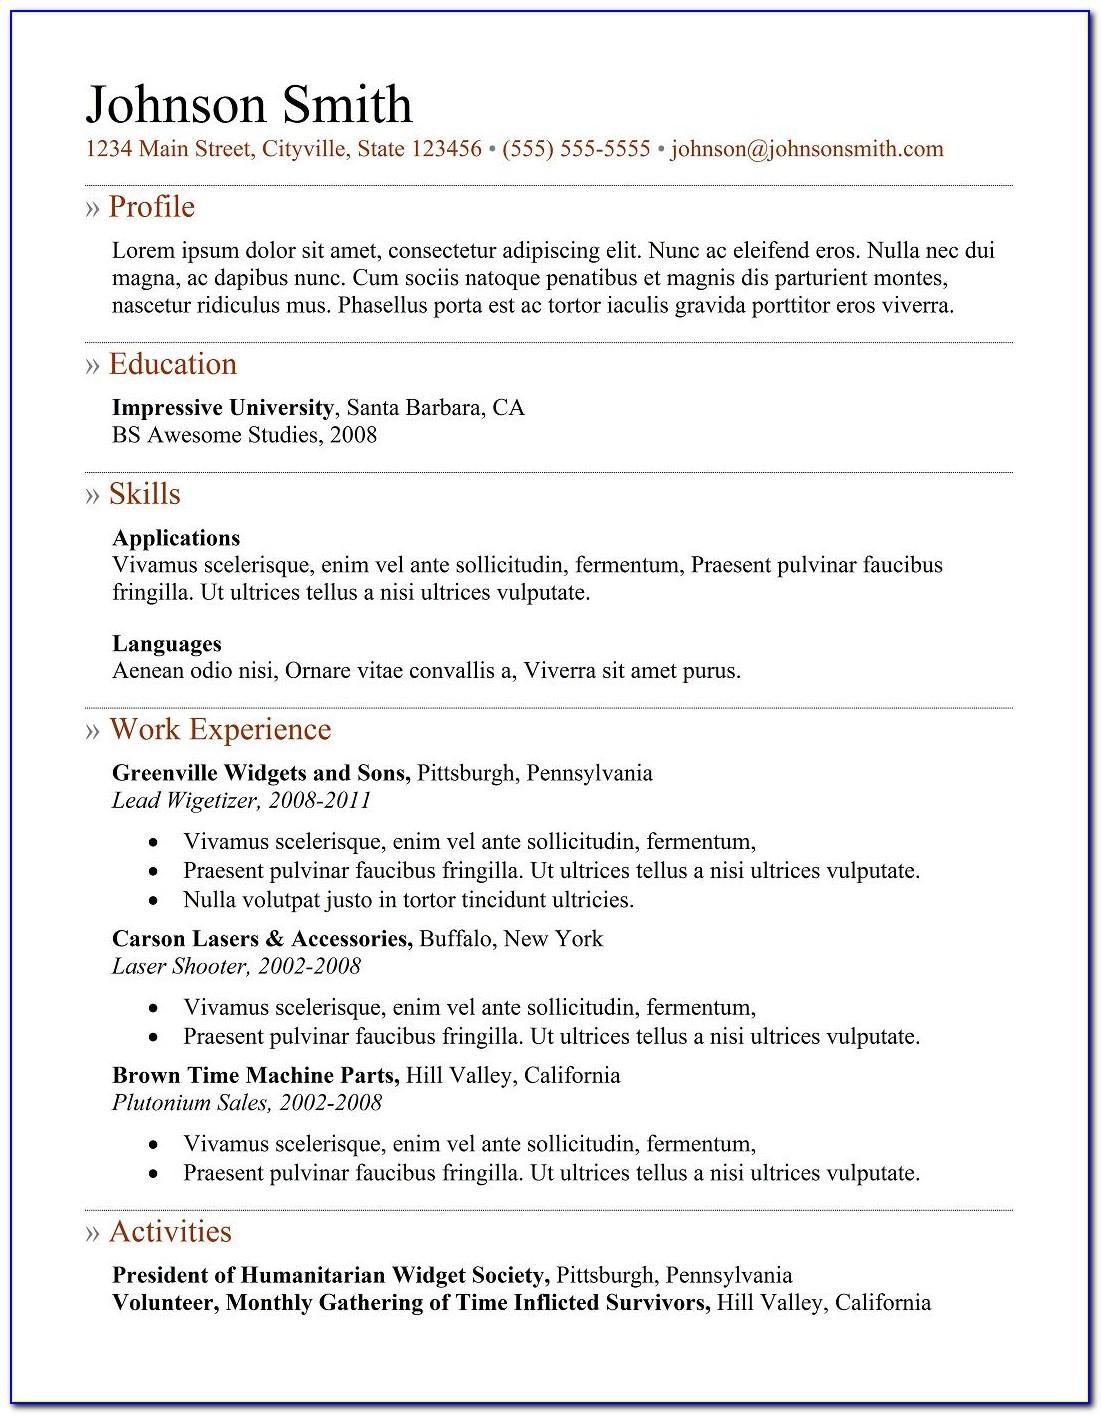 Free Resume Templates For Veterans